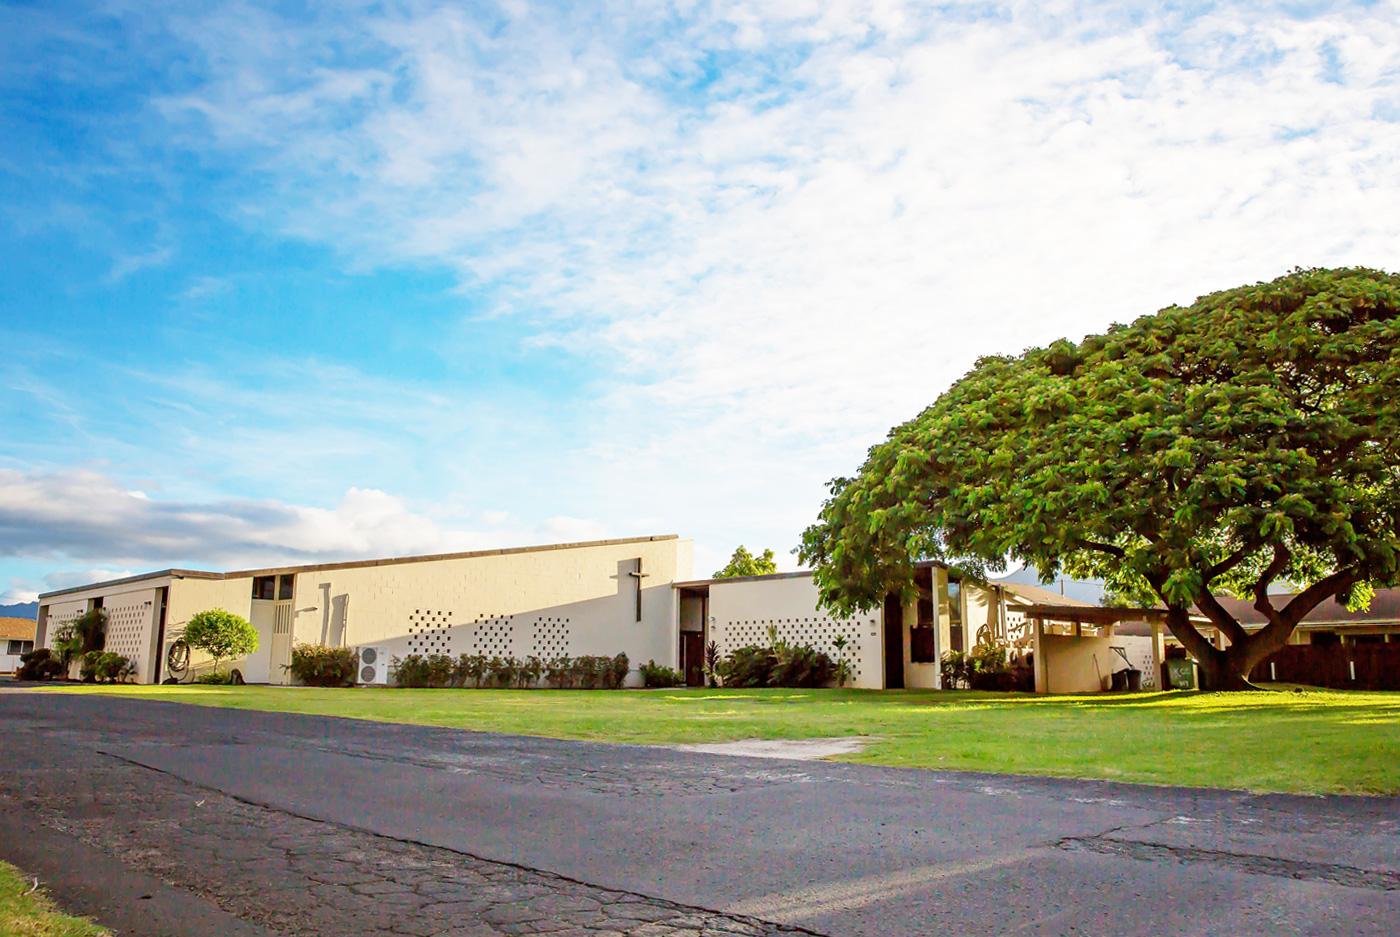 Kailua Church United